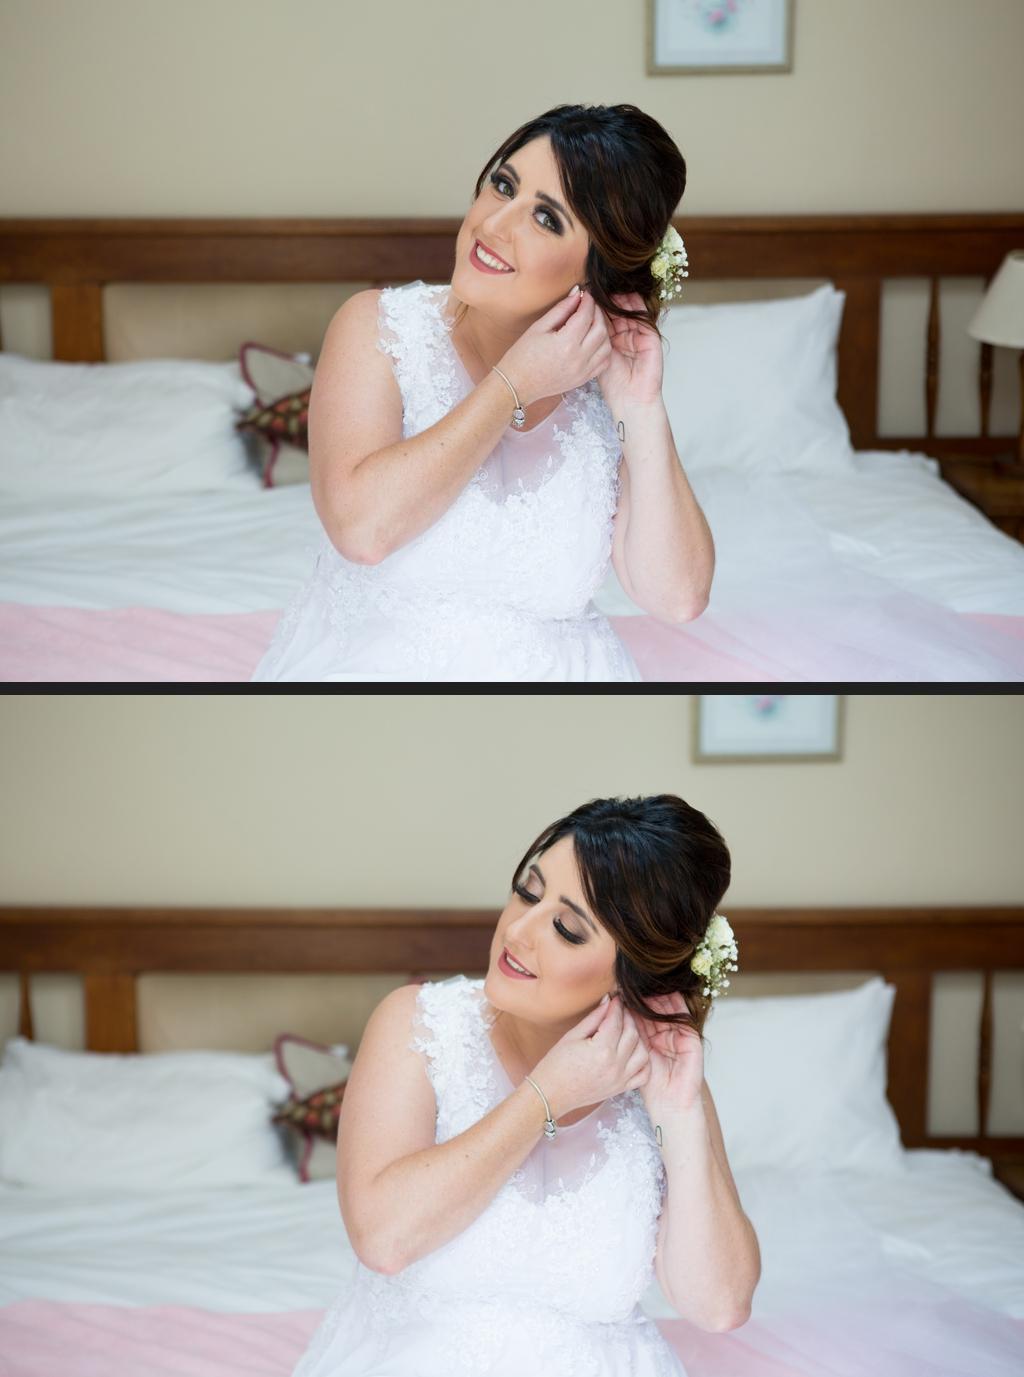 Savanna-lee's-wedding-at-sweet-home-wedding-venue-Durban-wedding-photographer